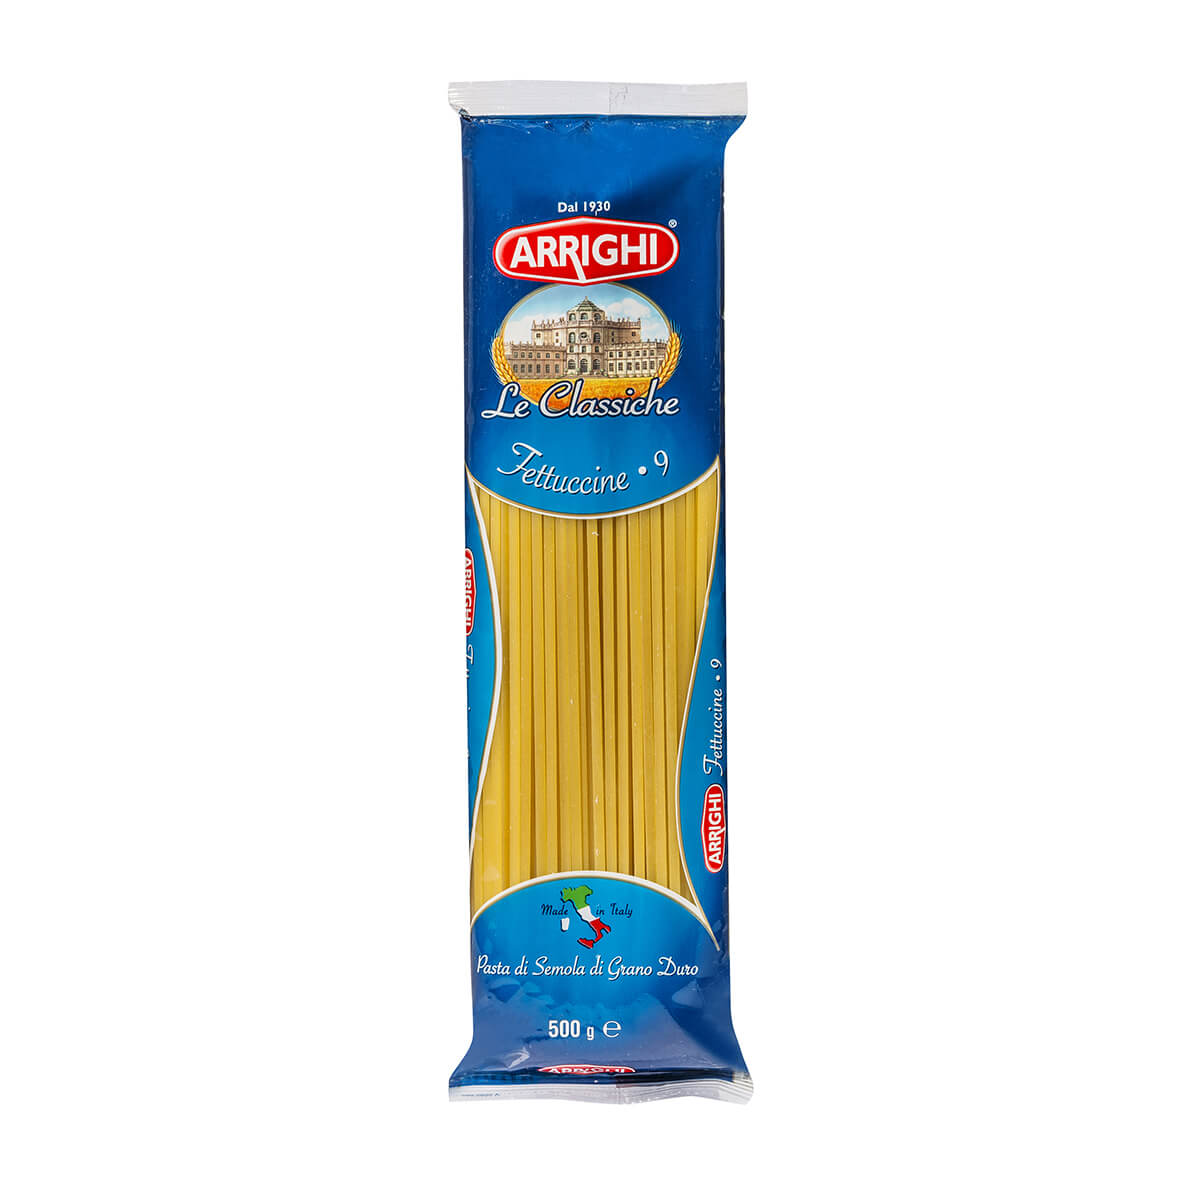 Golden Grains Arrighi - Fettuccine - Front (1).jpg